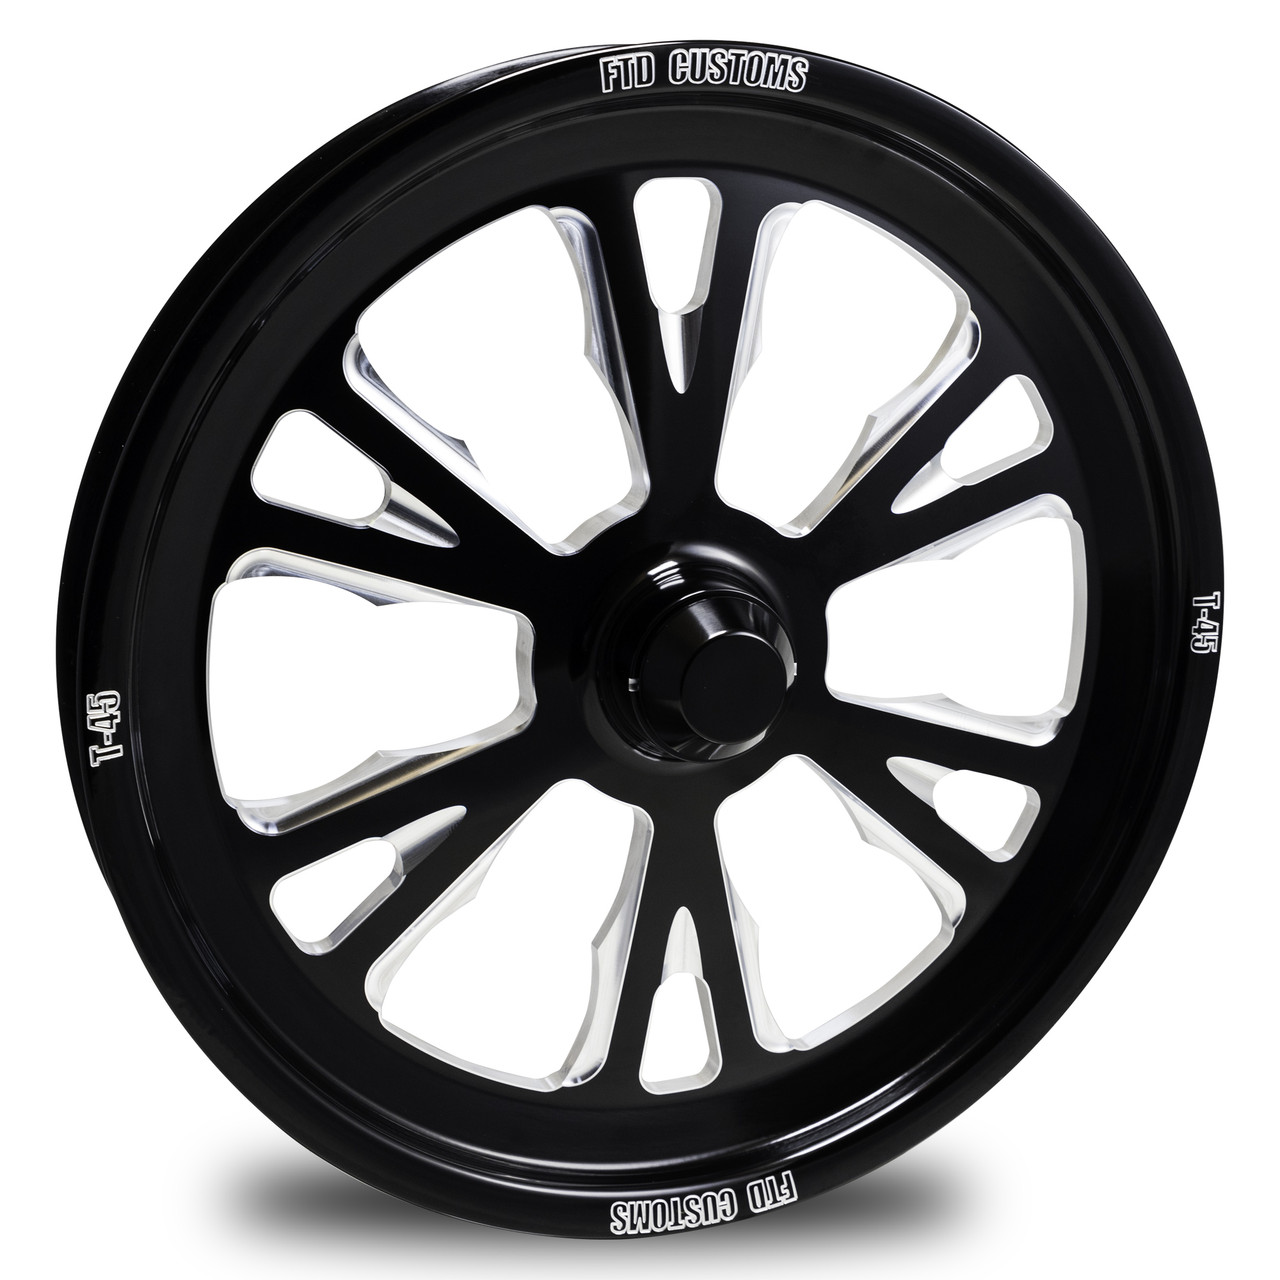 FTD T-45 Black Contrast Dragster Front Wheels